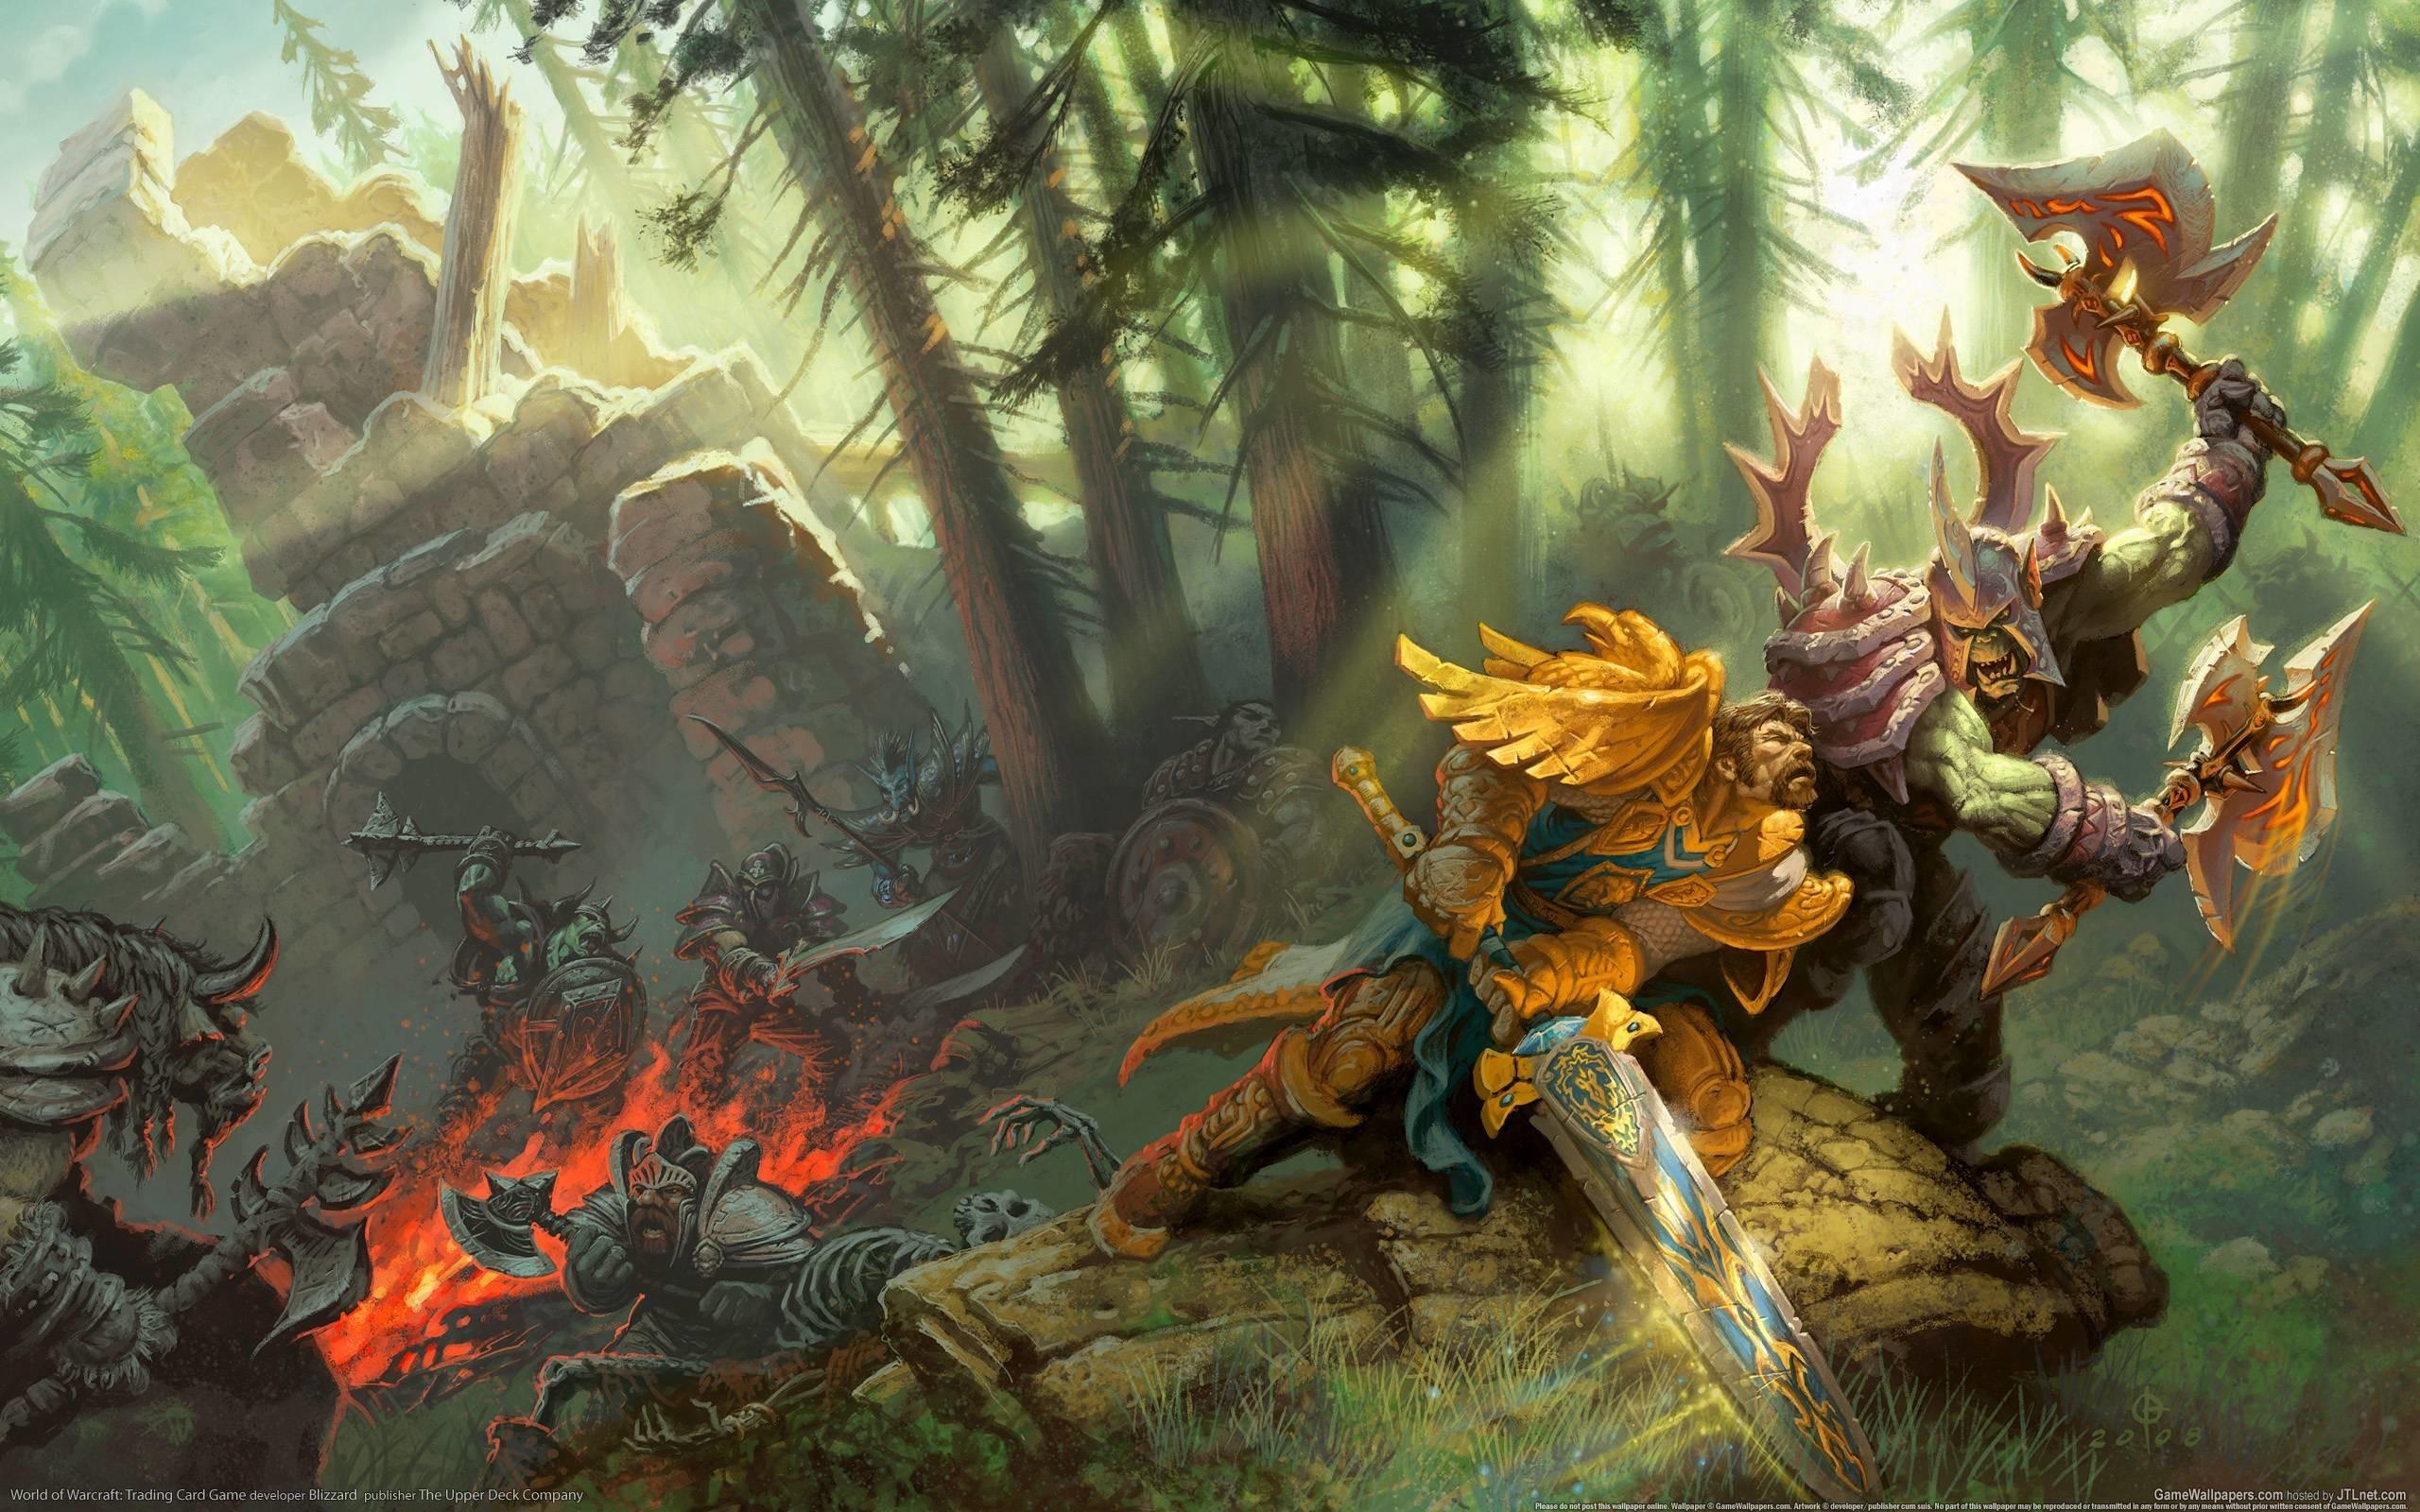 epic fight : Desktop and mobile wallpaper : Wallippo